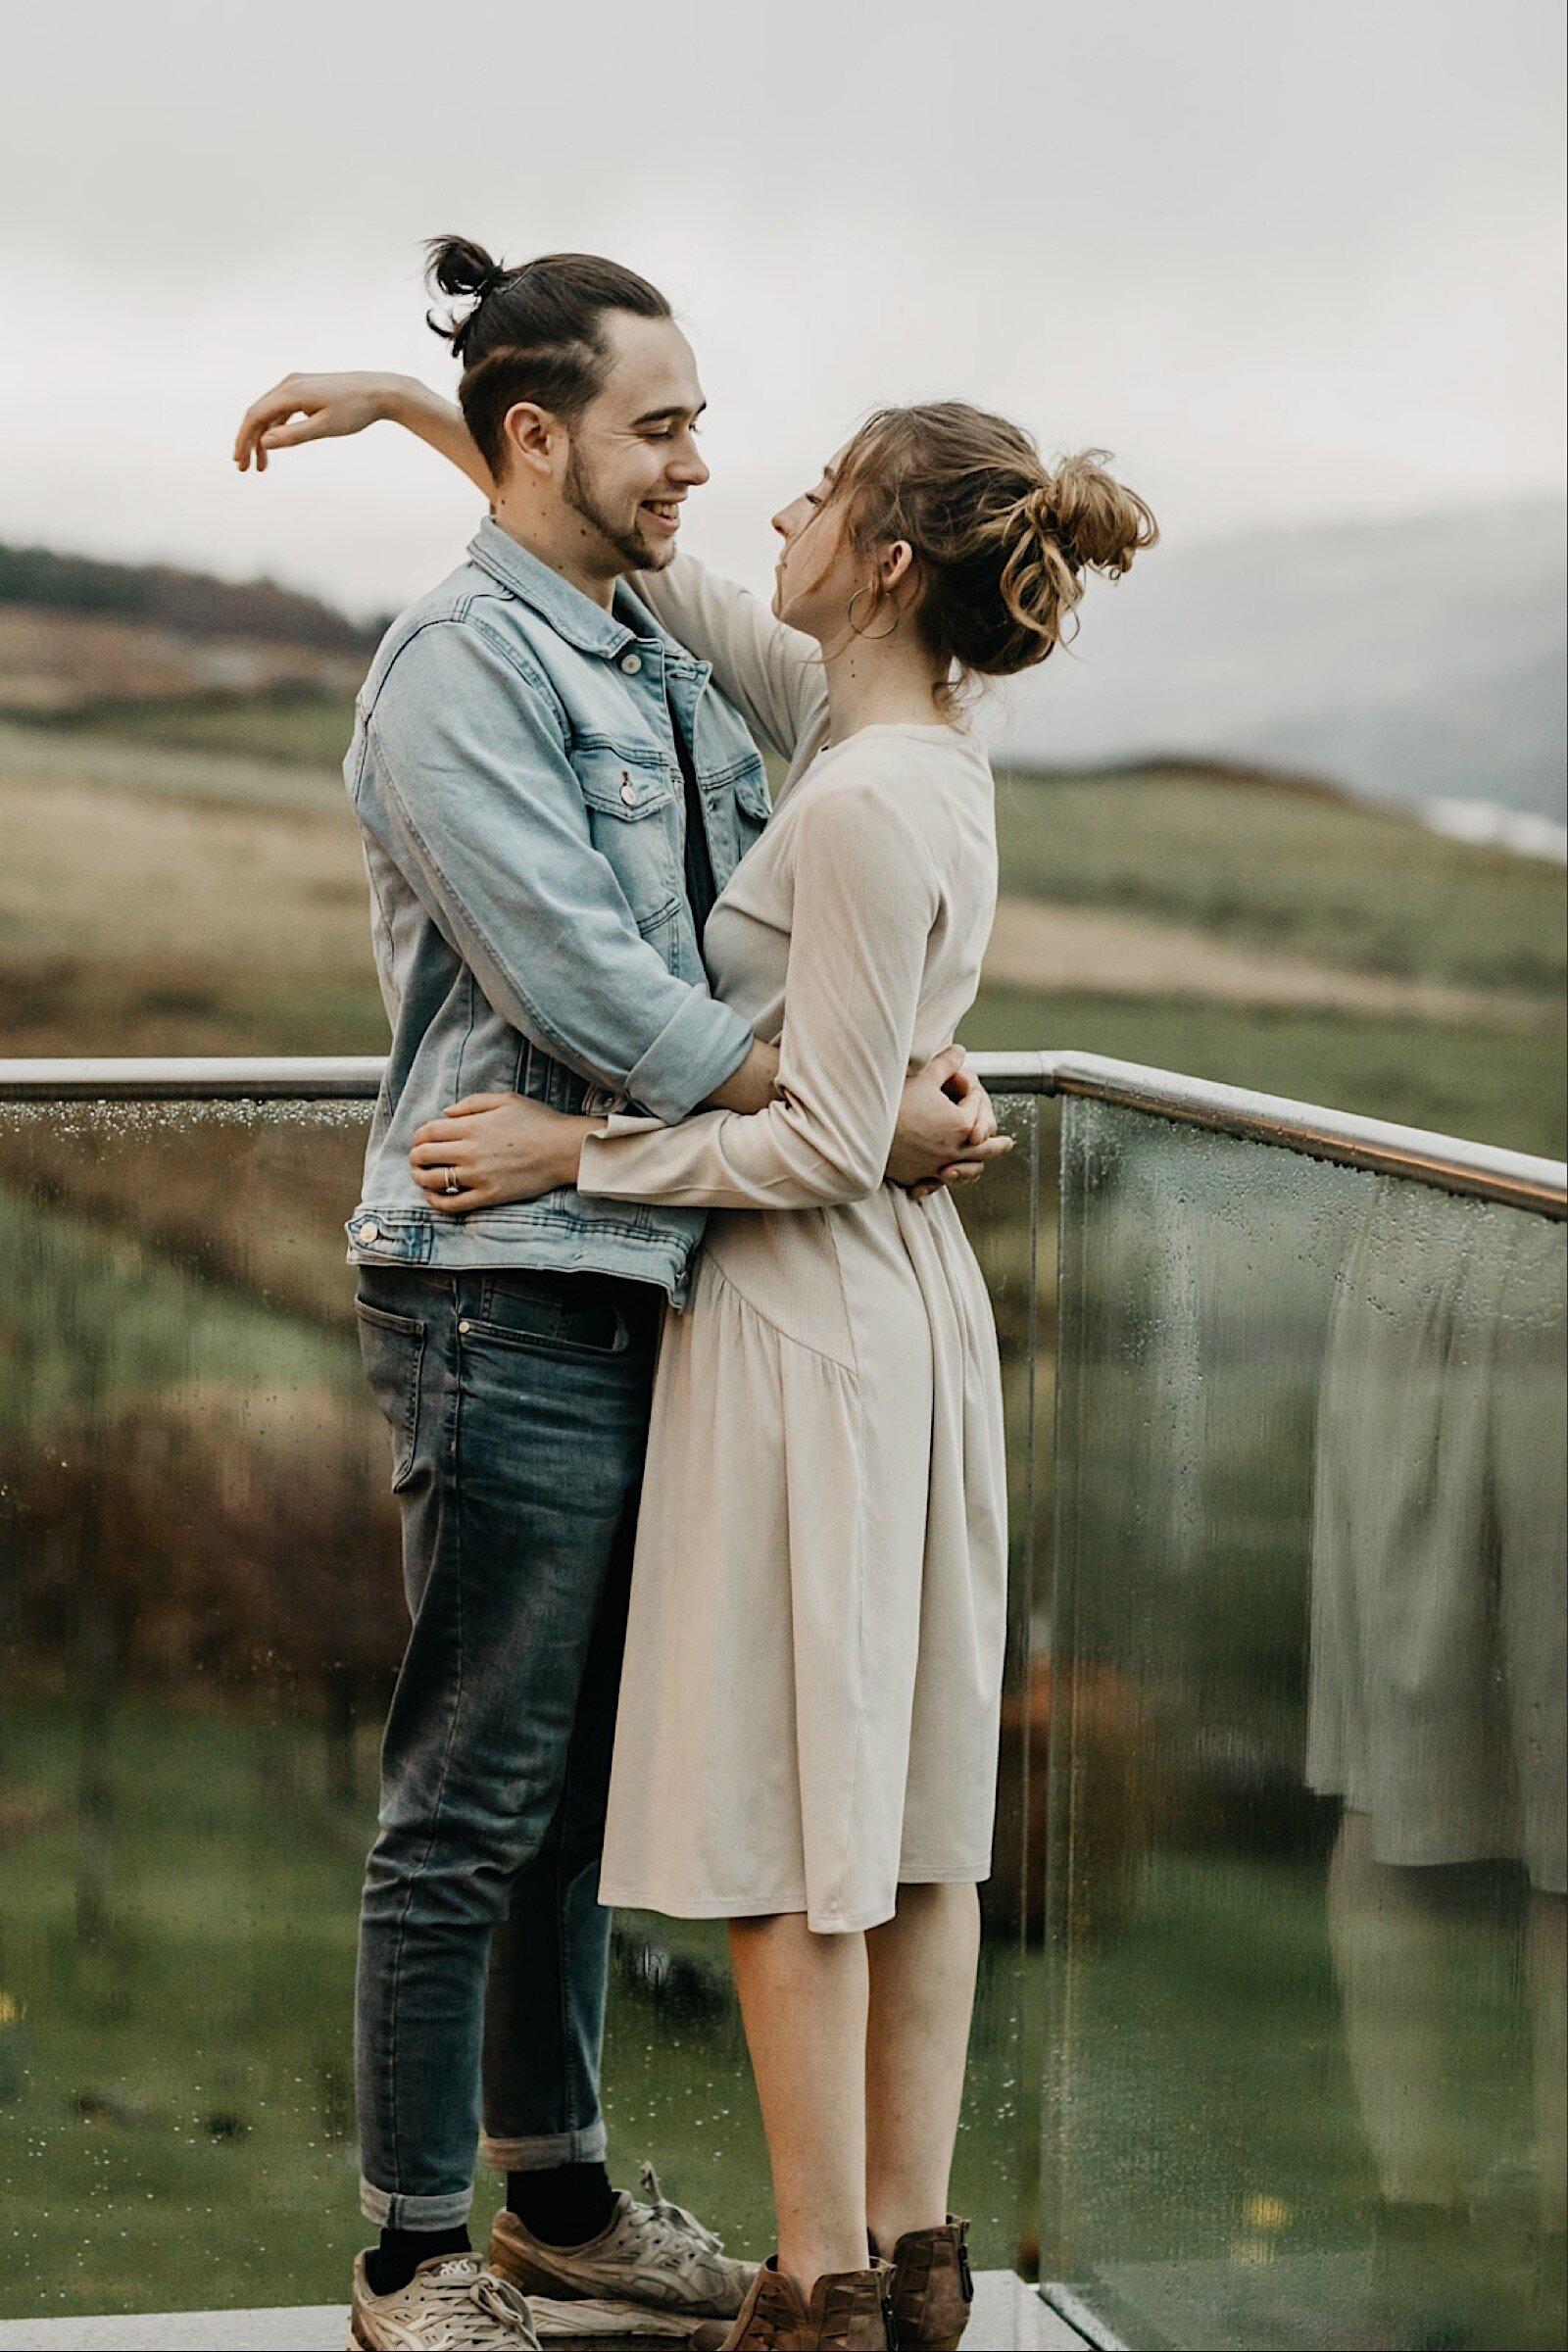 12_scotland_couple_shoot_lety_photography (36 von 36).jpg